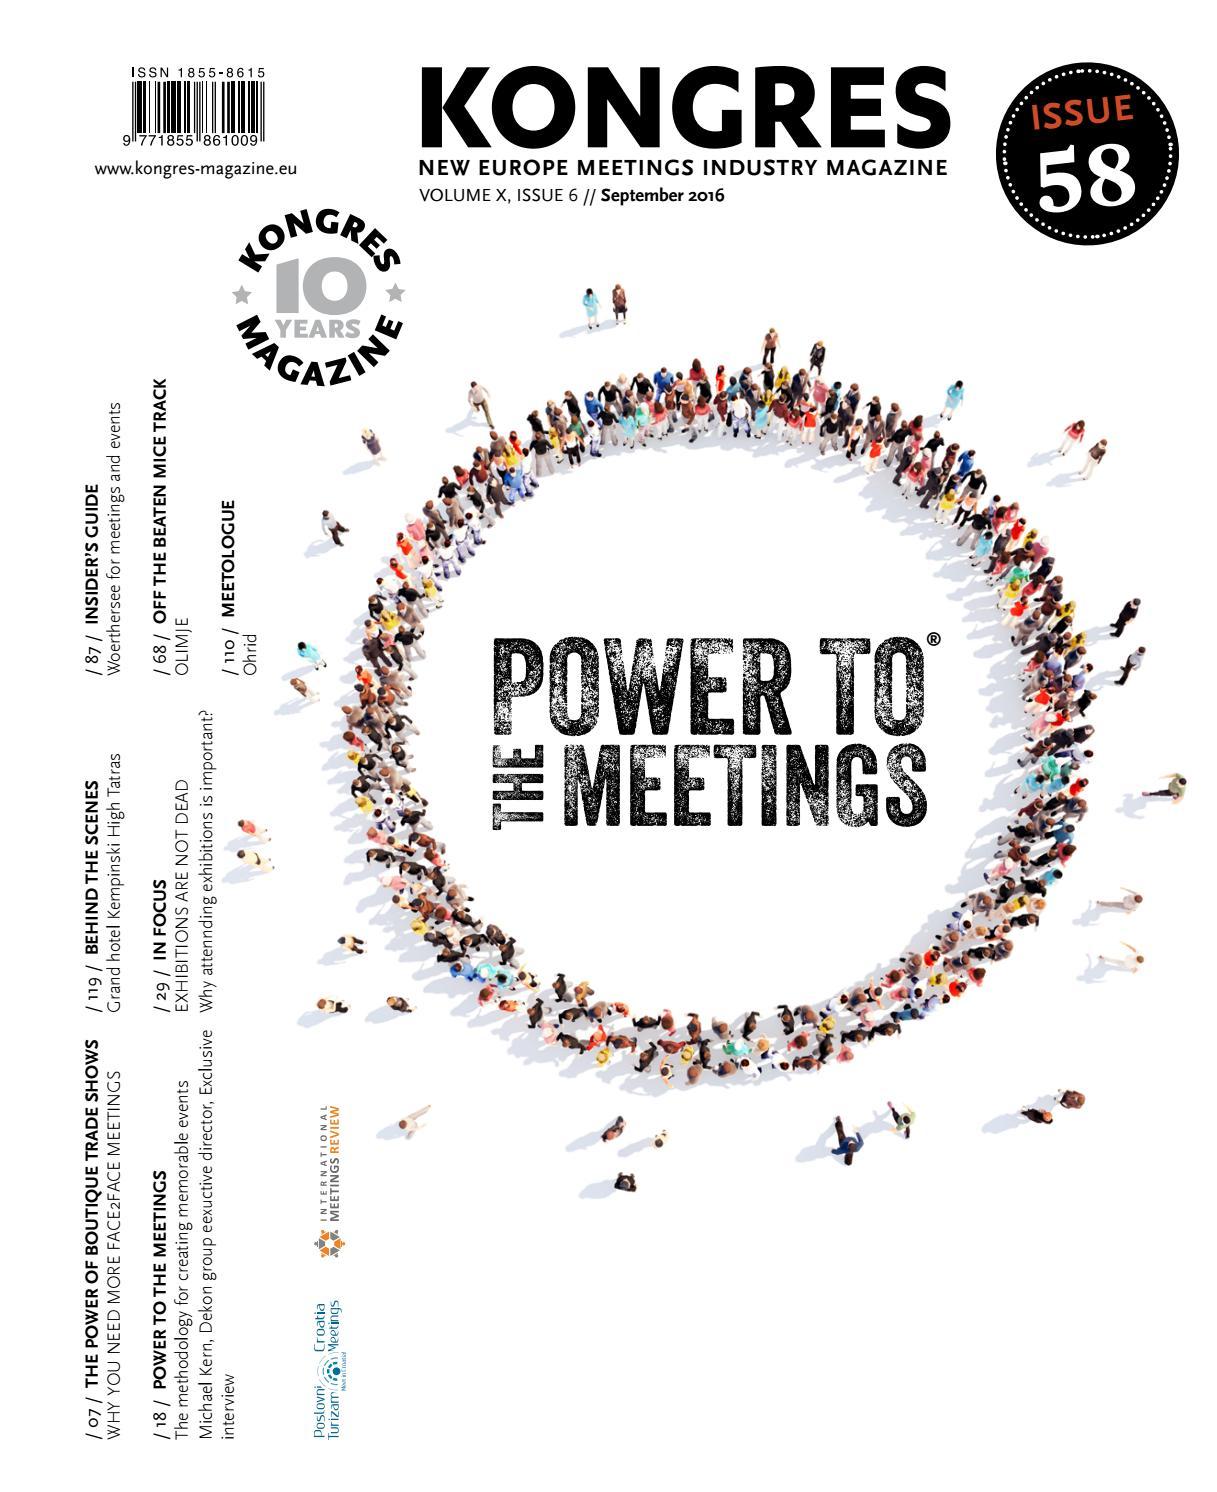 Kongres Magazine Autumn Issue 2016 By Kongres Magazine Issuu